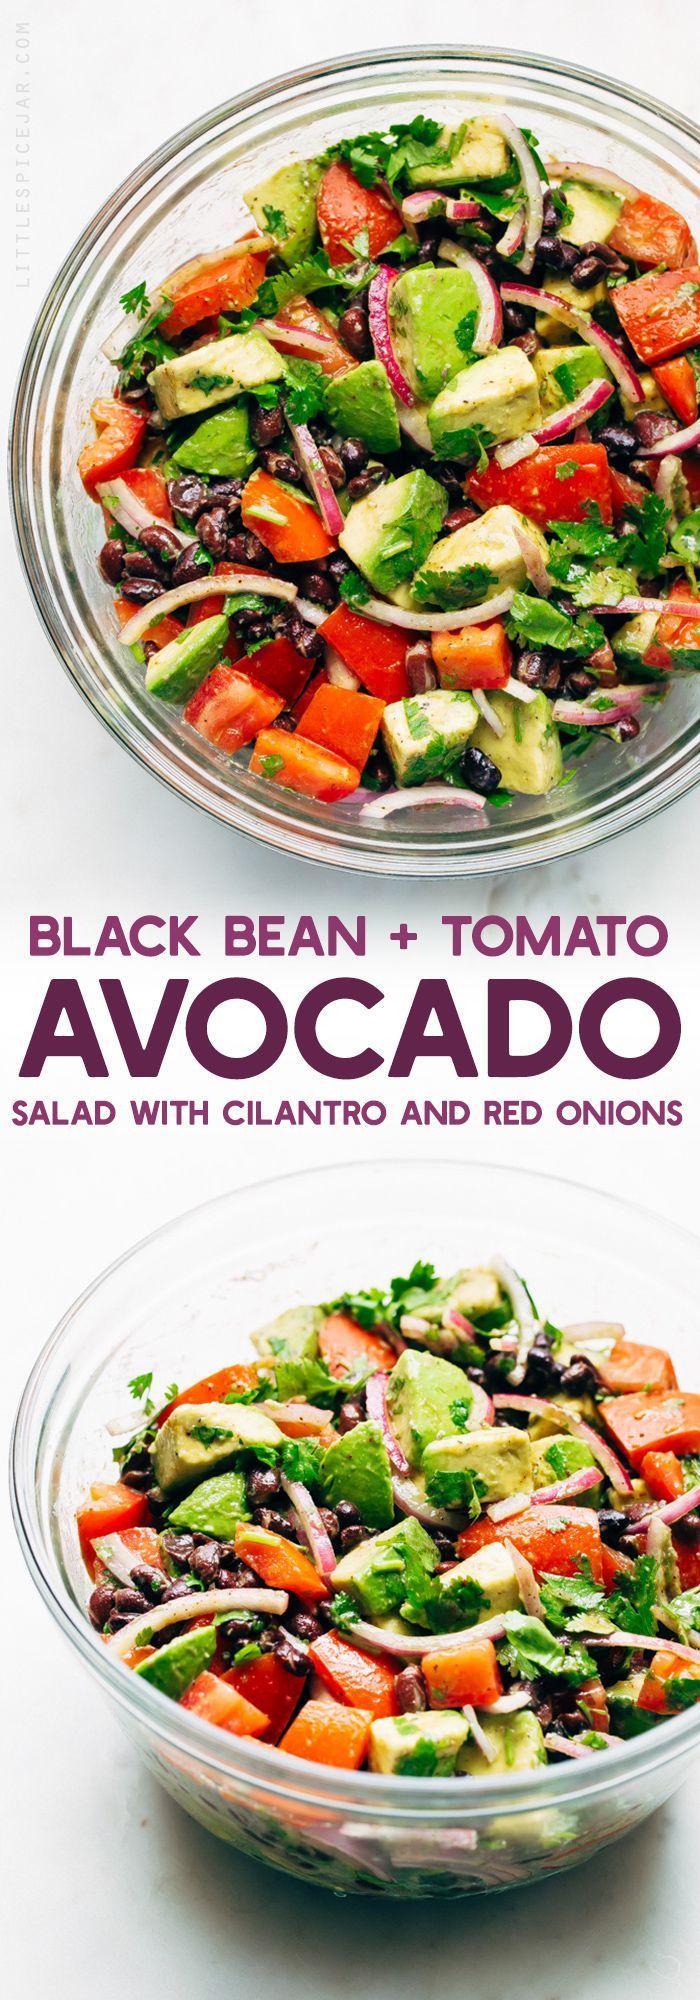 Black Bean Tomato Avocado Salad - A simple avocado salad that tastes just like guacamole!